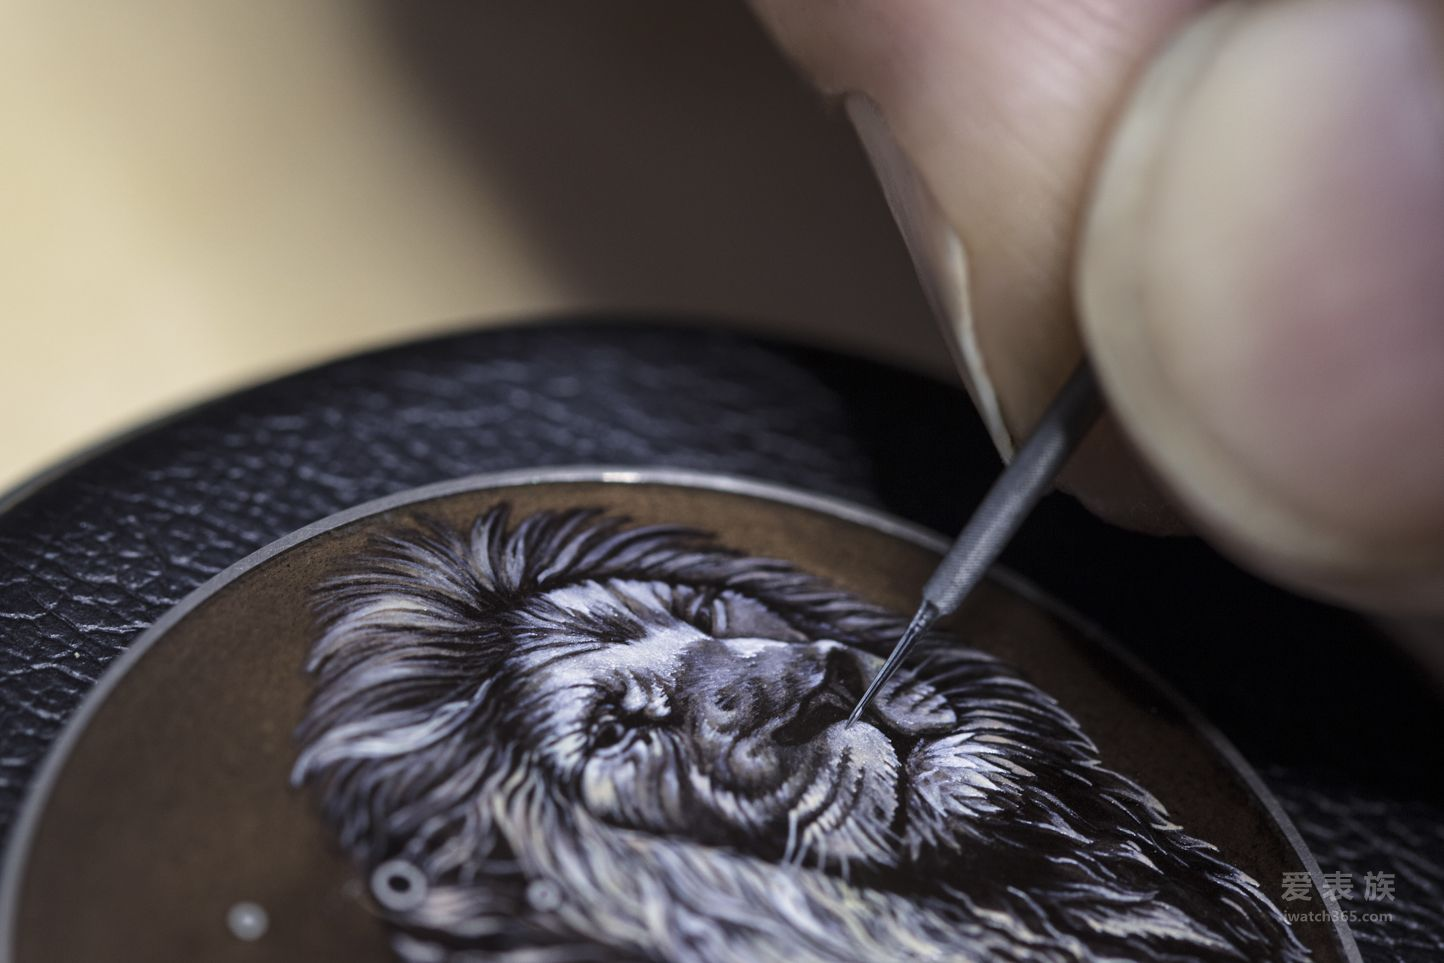 "Les Cabinotiers阁楼工匠系列14天陀飞轮""丛林之王""腕表:鲜活生动的猛兽图案,华丽绝美的大明火珐琅"